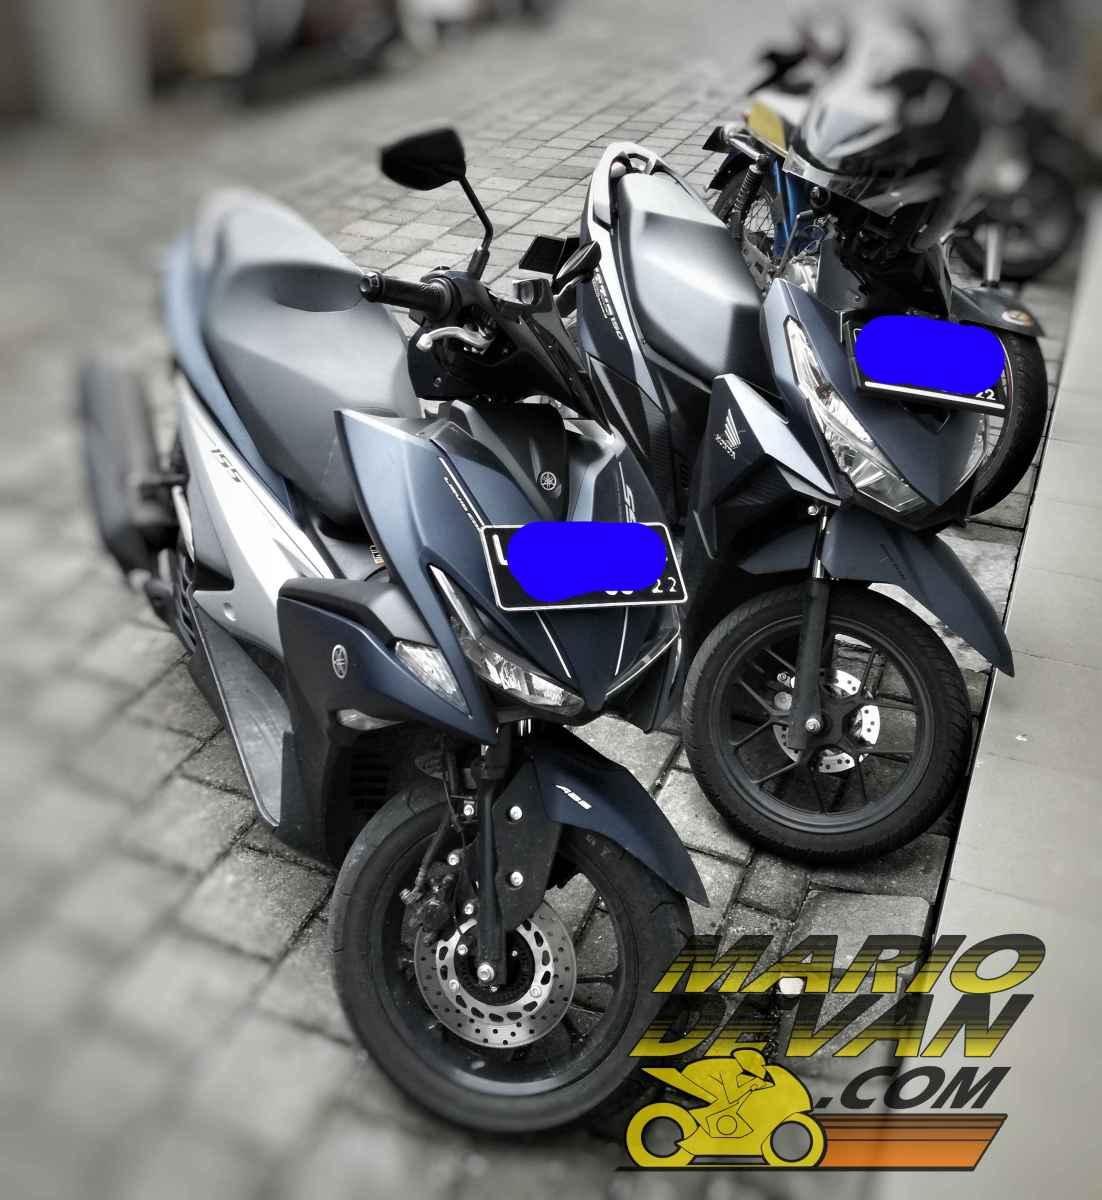 Yamaha Aerox 155 vs Honda Vario 150 pilih mana??